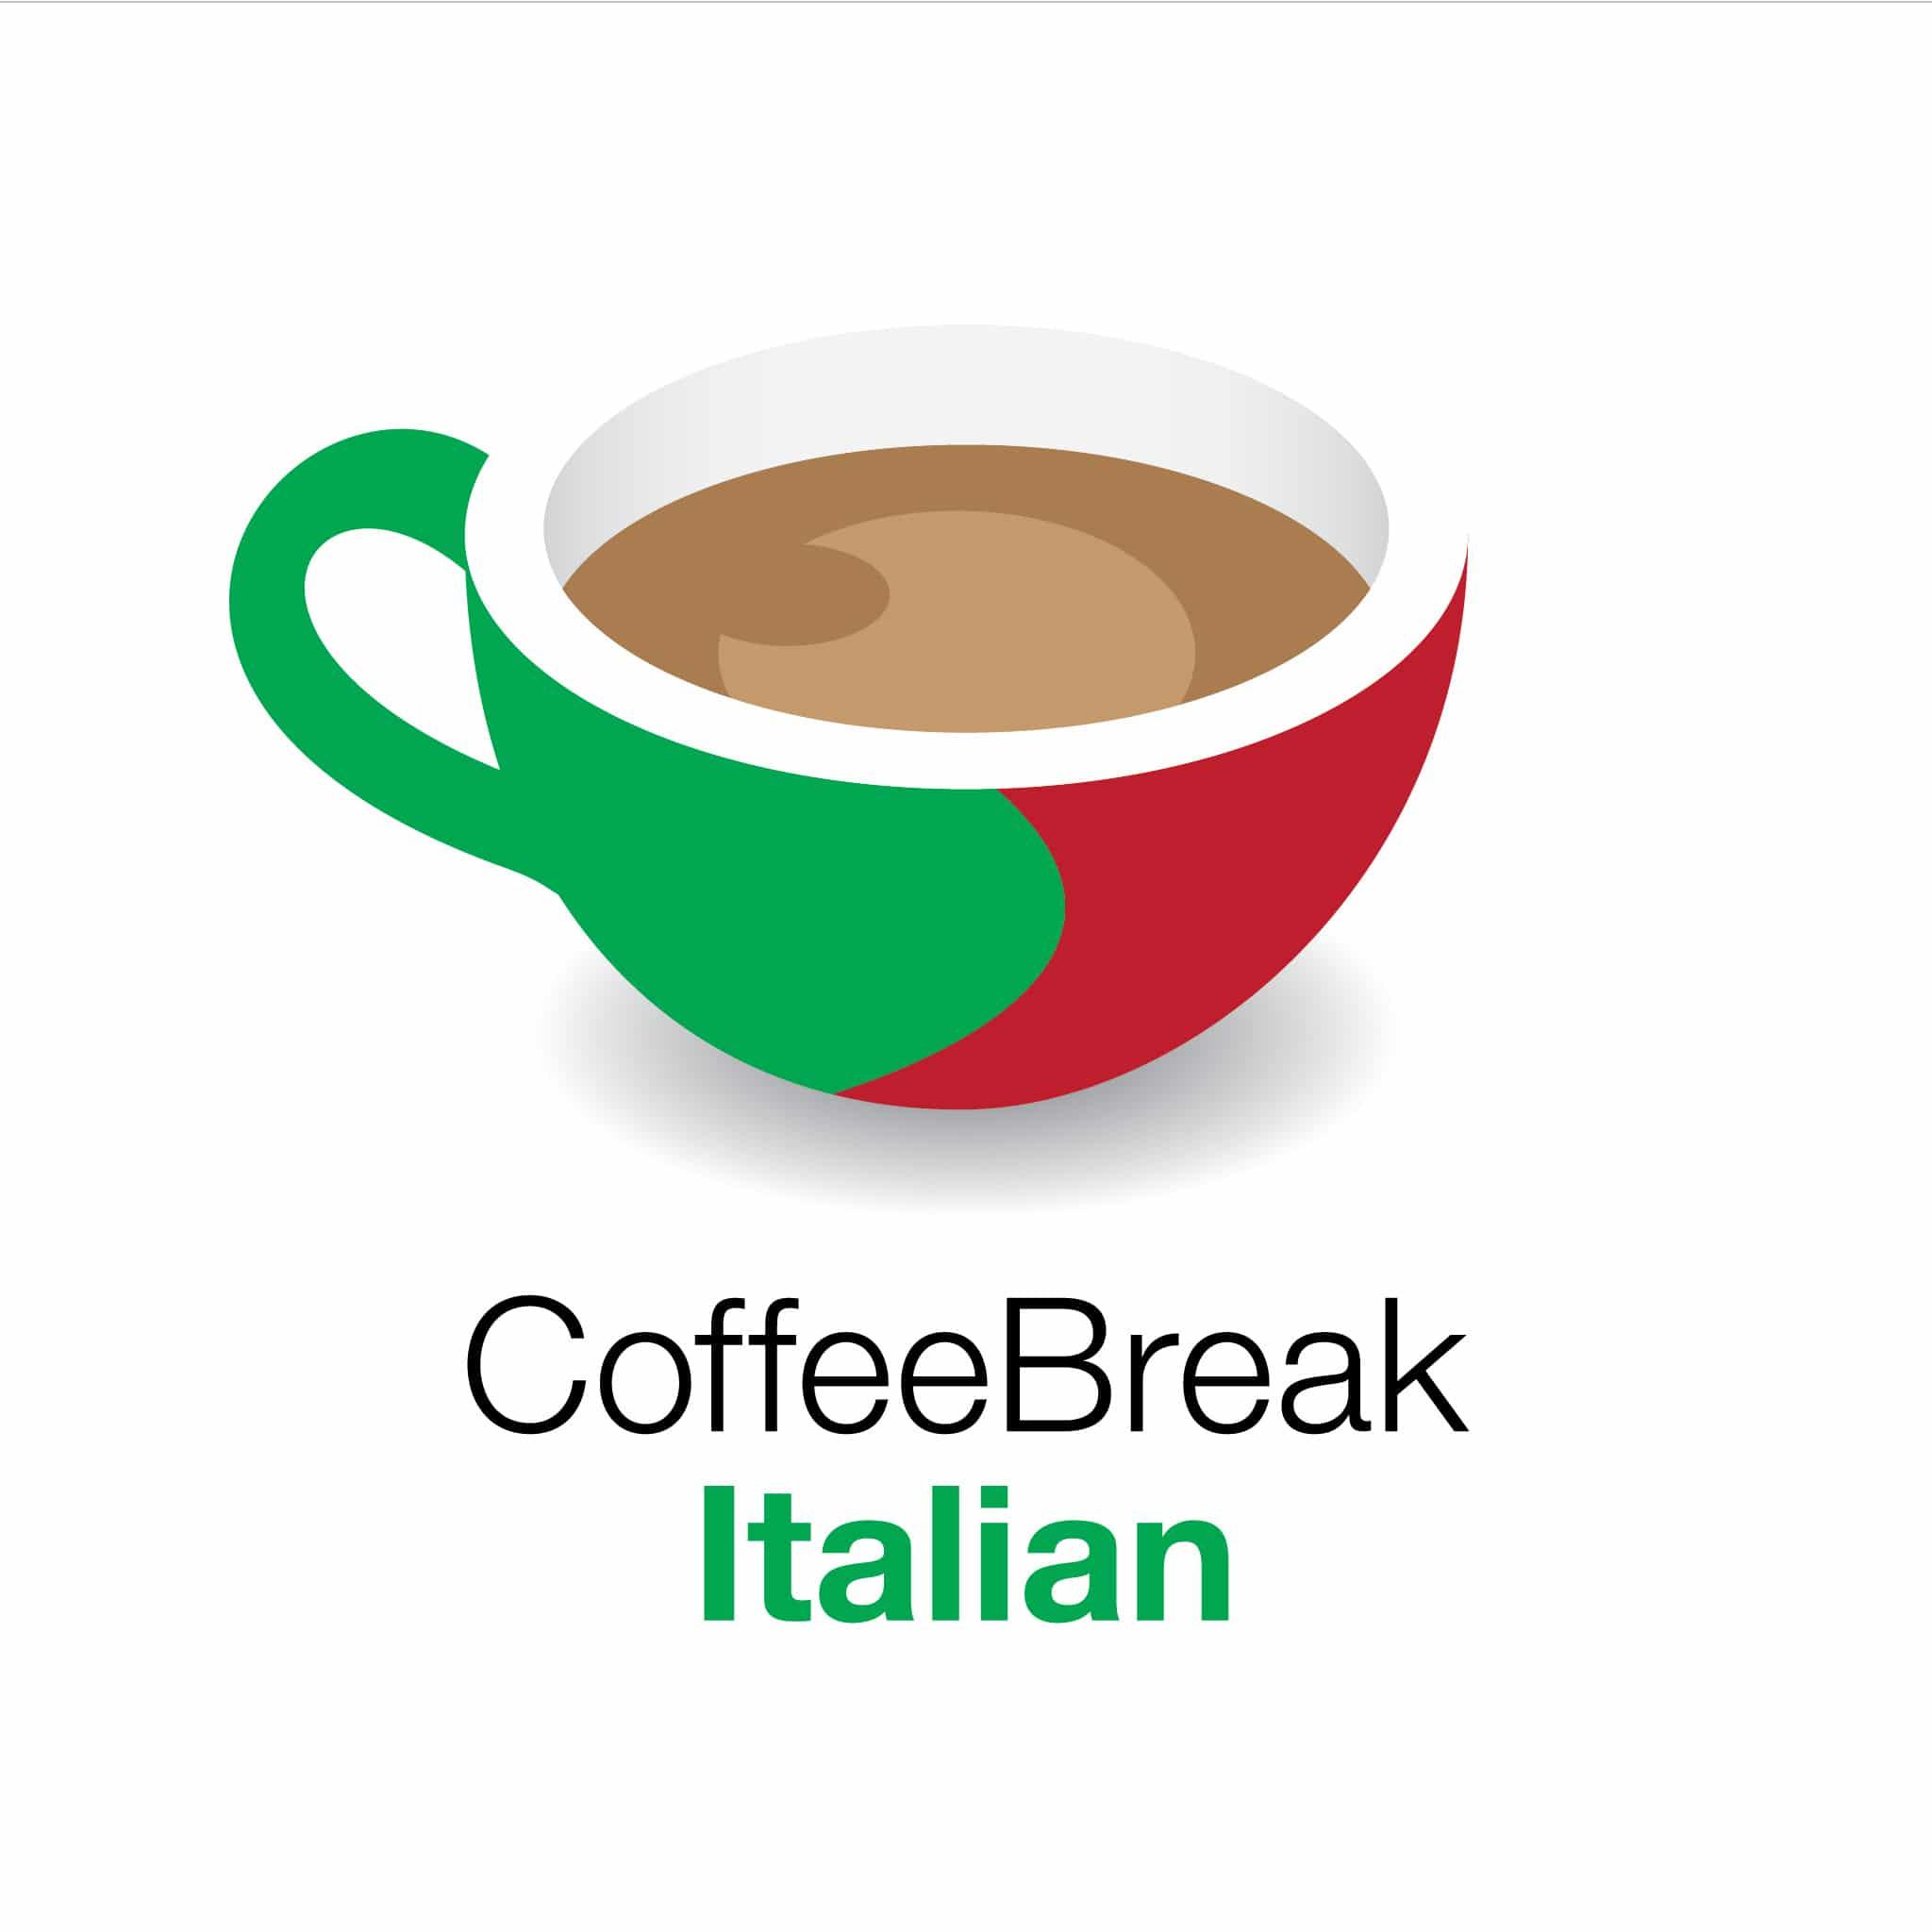 Italian Translation English To Italian: 5 Creative Ideas For Italian Translation Exercises